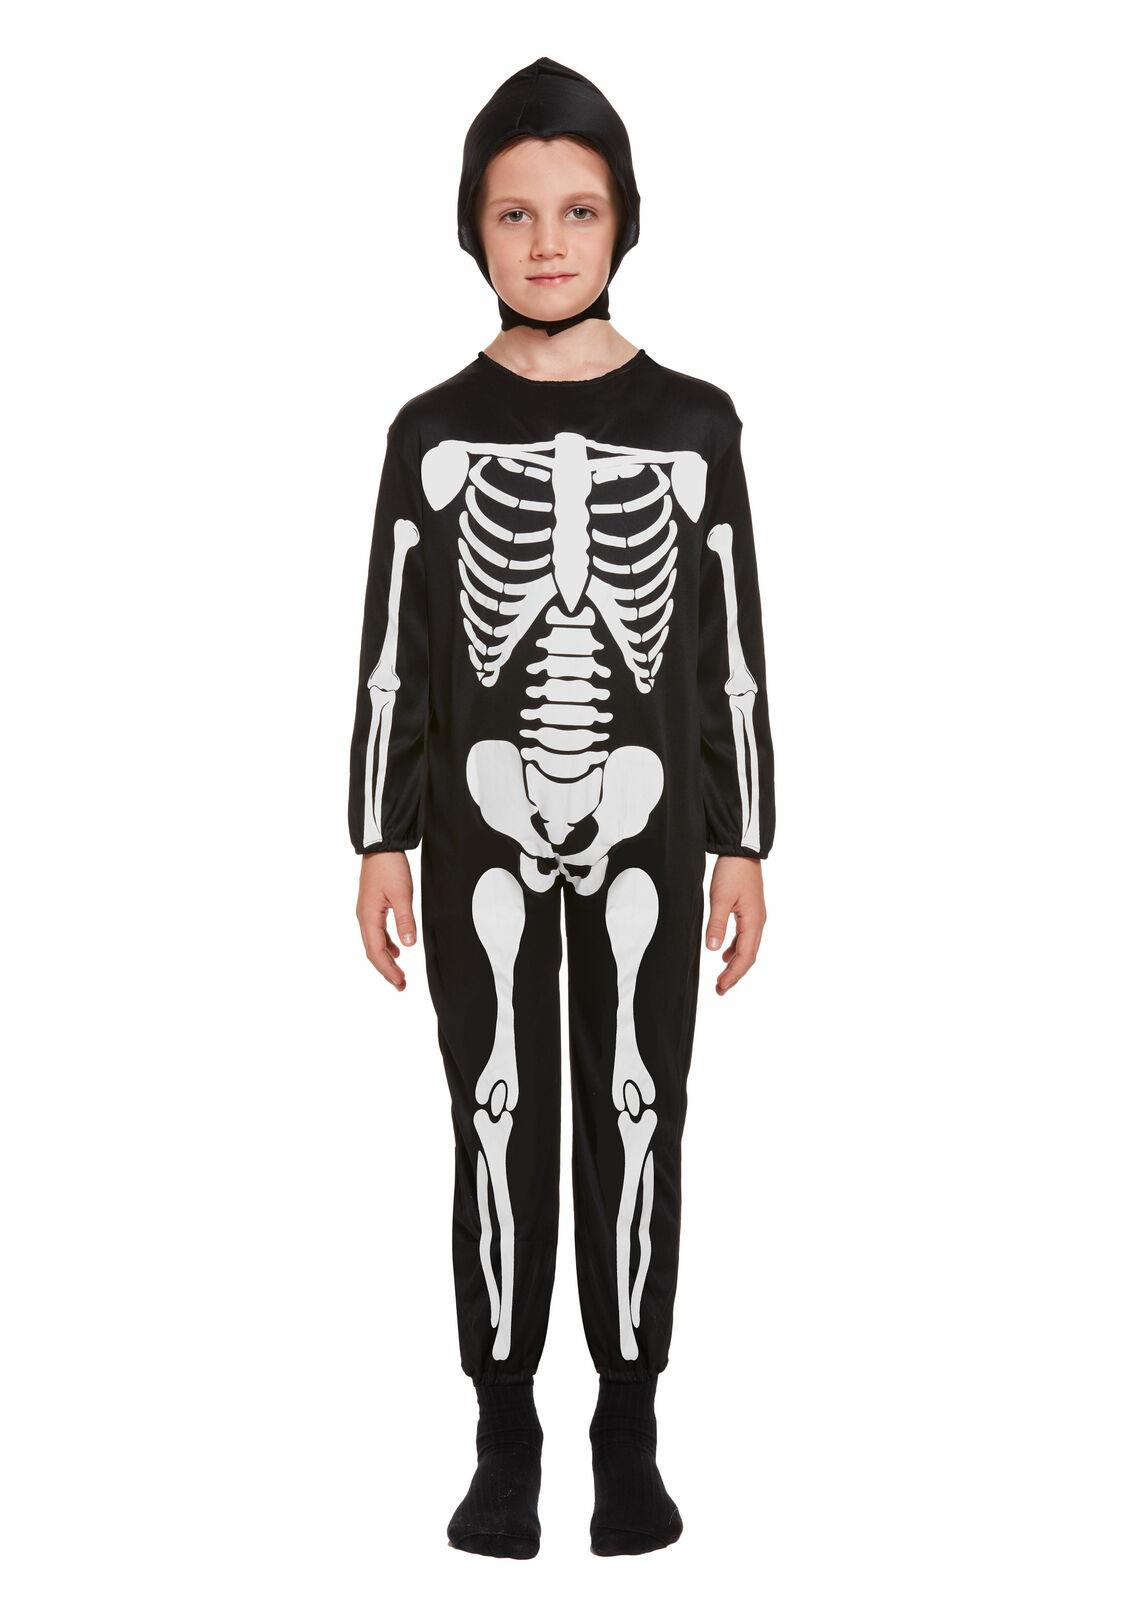 Boys Skeleton Costume Childs Scary Skull Kids Halloween Fancy Dress Outfit